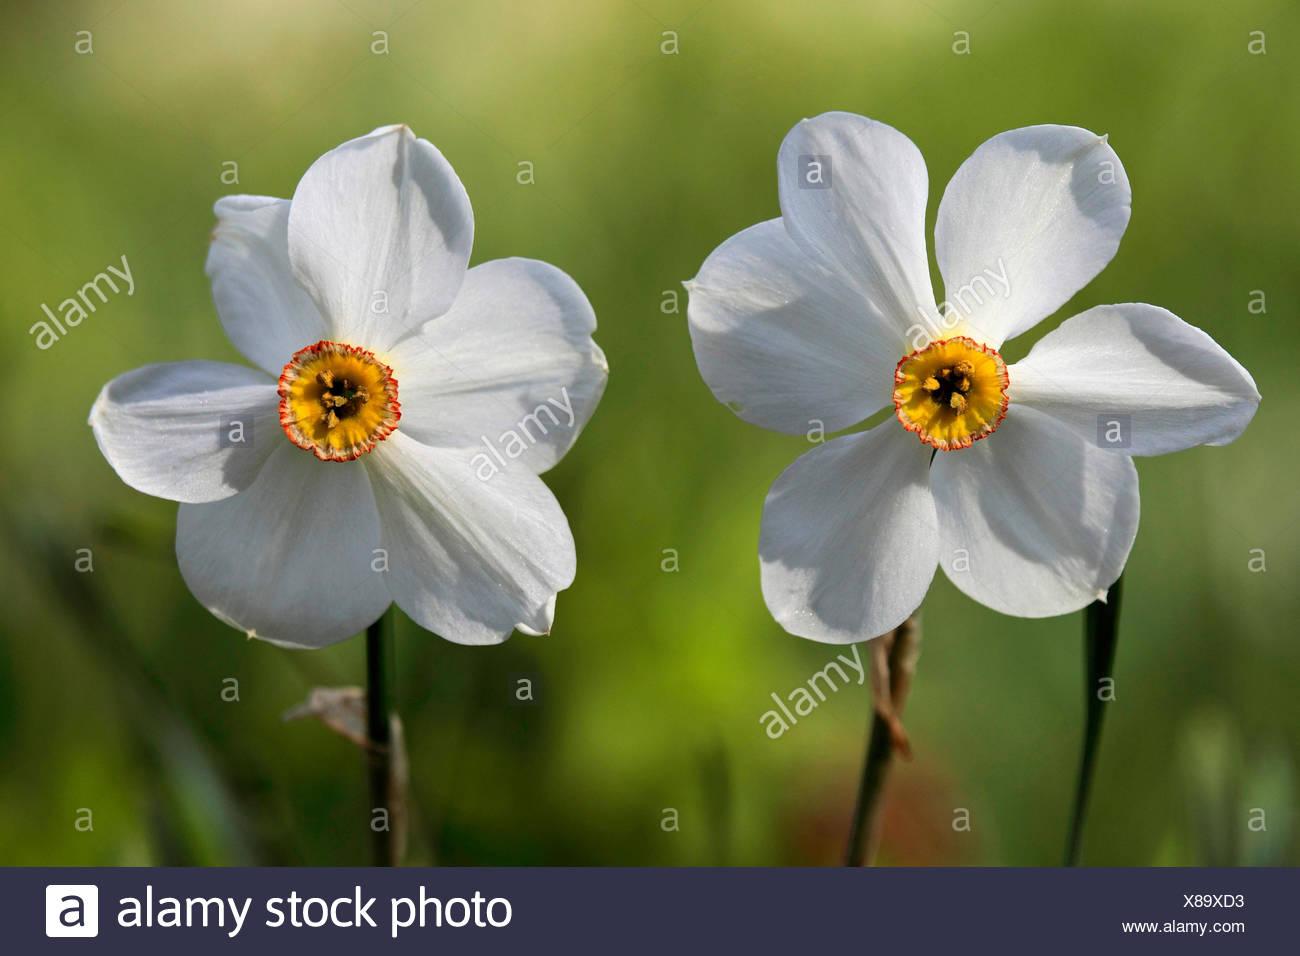 poet's narcissus (Narcissus poeticus), flowers - Stock Image